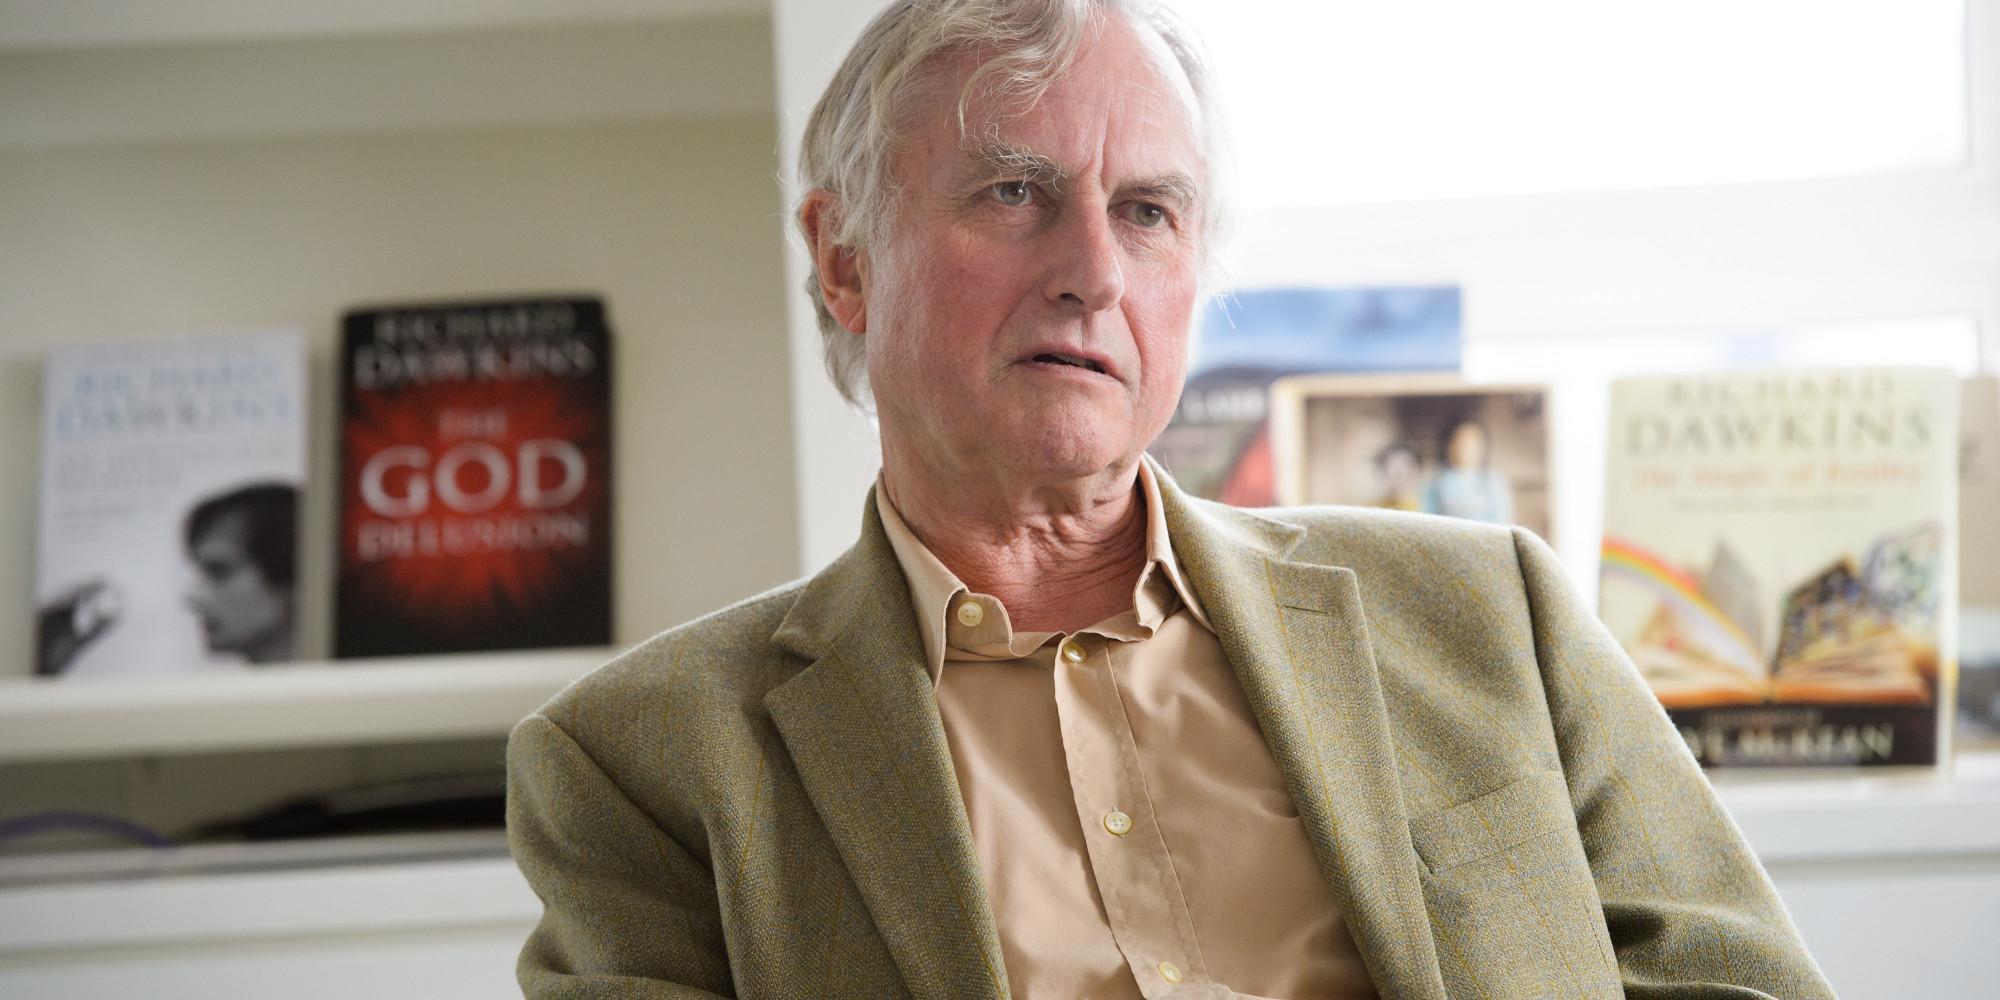 Richard Dawkins Accuses Pope Francis Of Religious